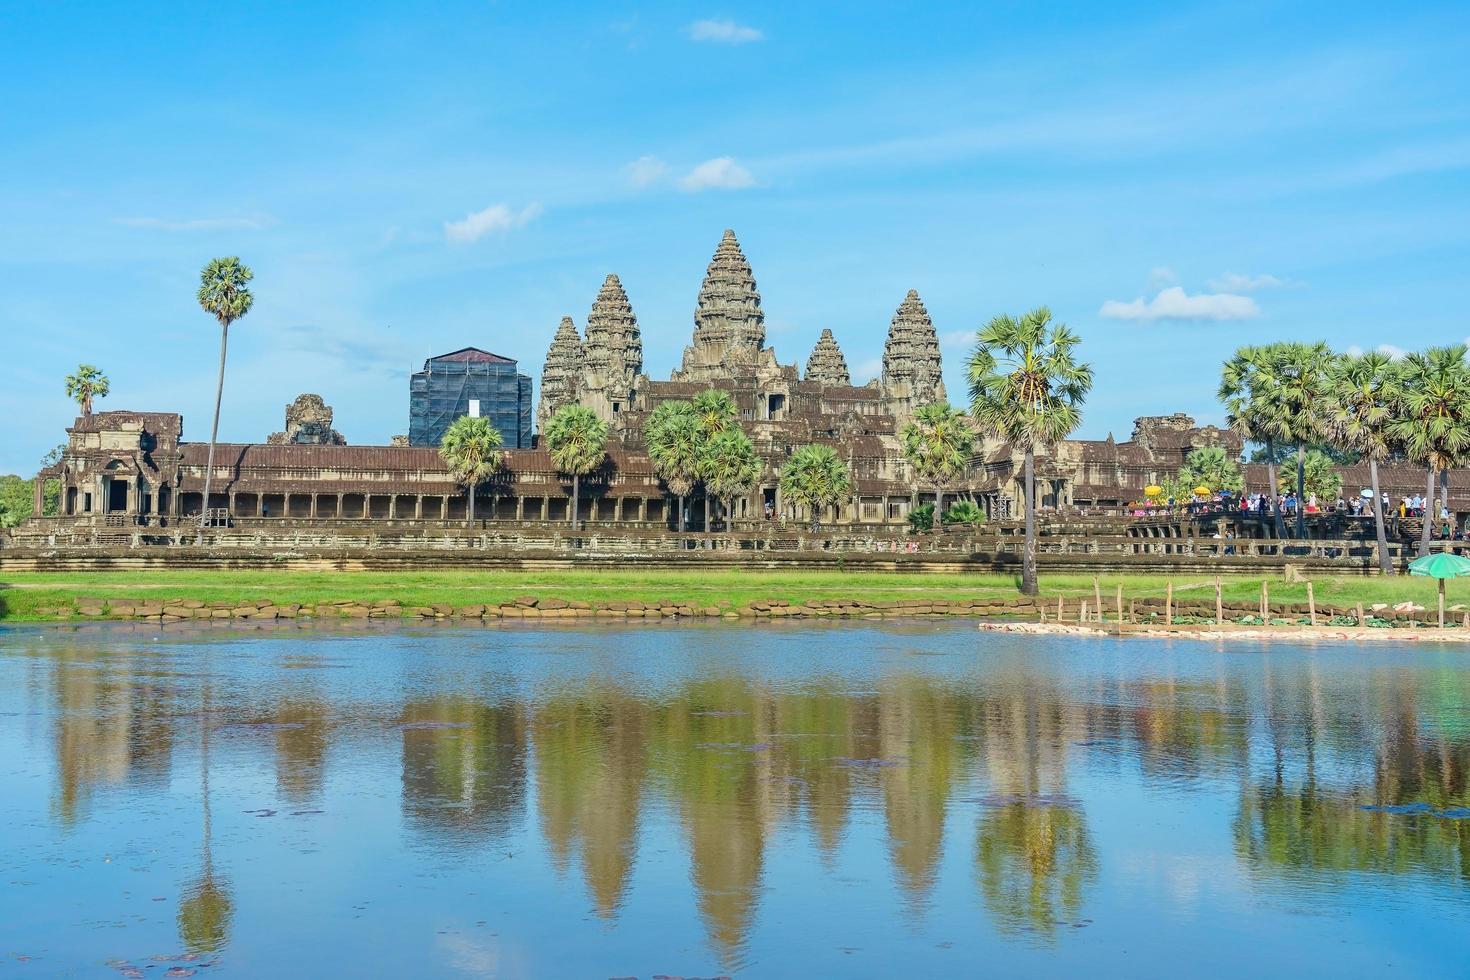 Antiguo templo en Angkor Wat, Siem Reap, Camboya foto